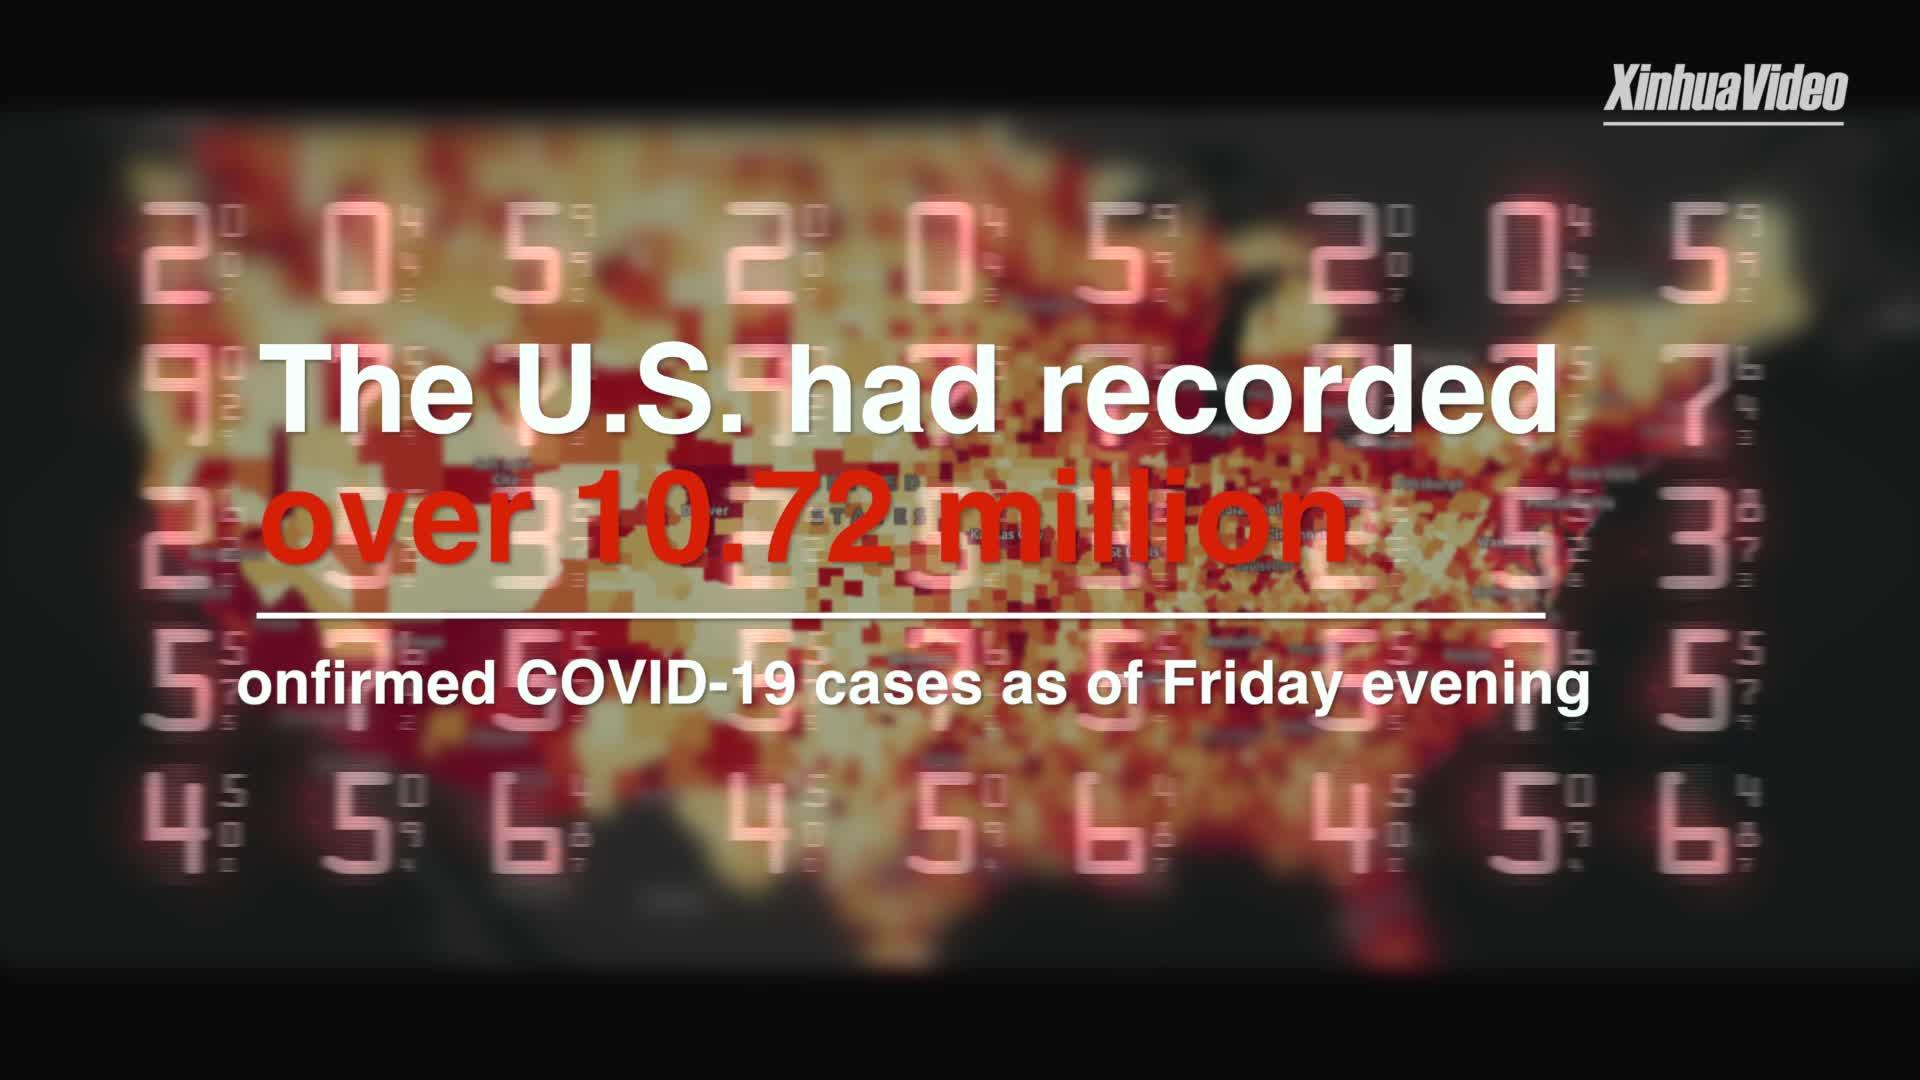 U.S. sets new world records in key COVID-19 metrics